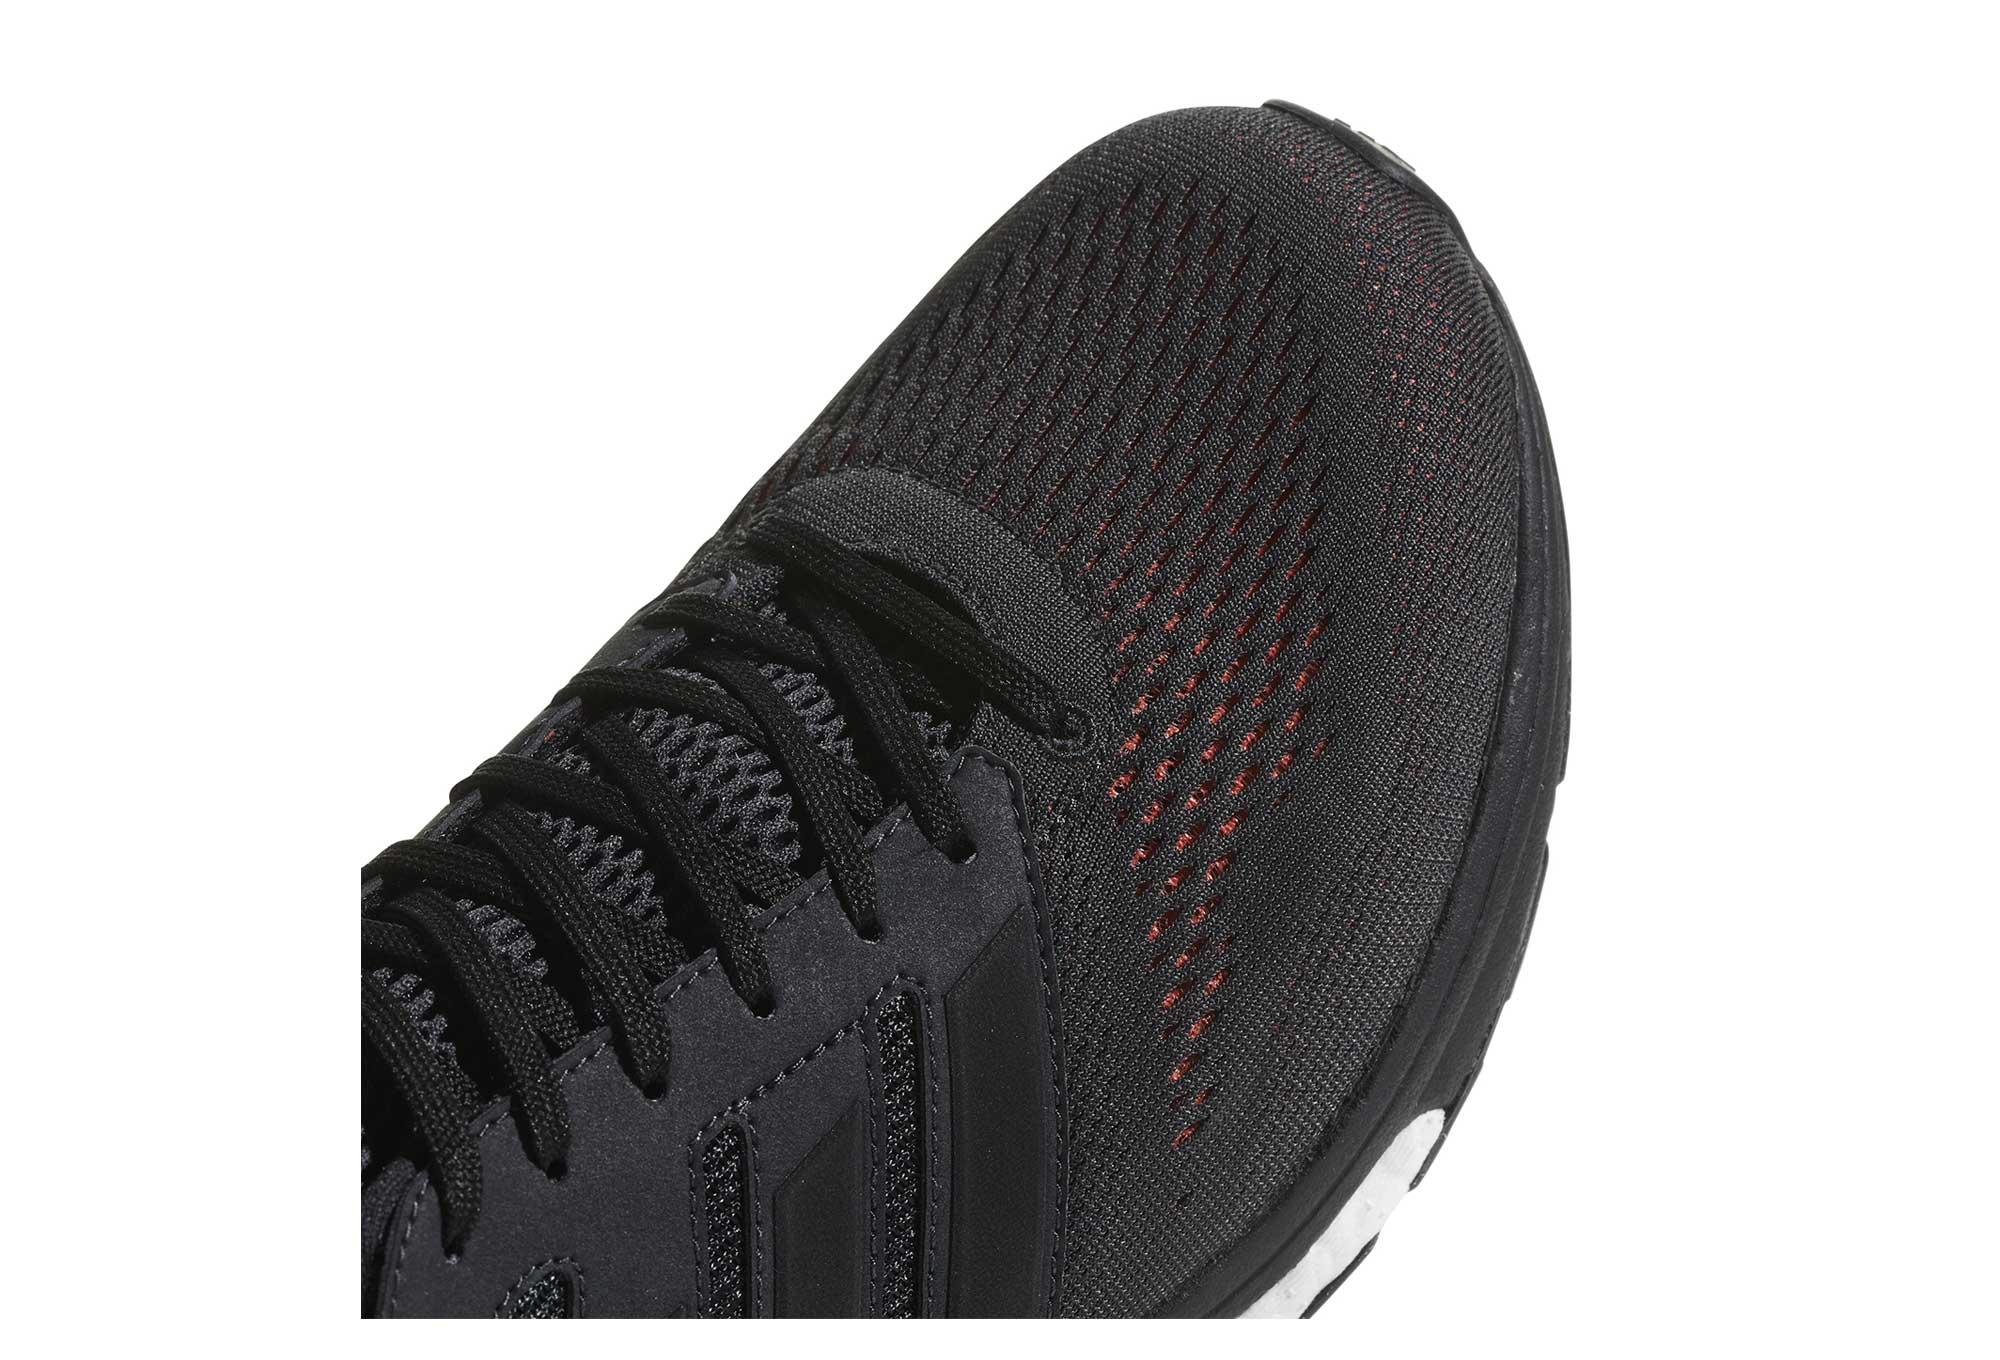 pretty nice 5c771 af413 Chaussures de Running adidas running adizero Boston 7 Gris  Noir  Rouge